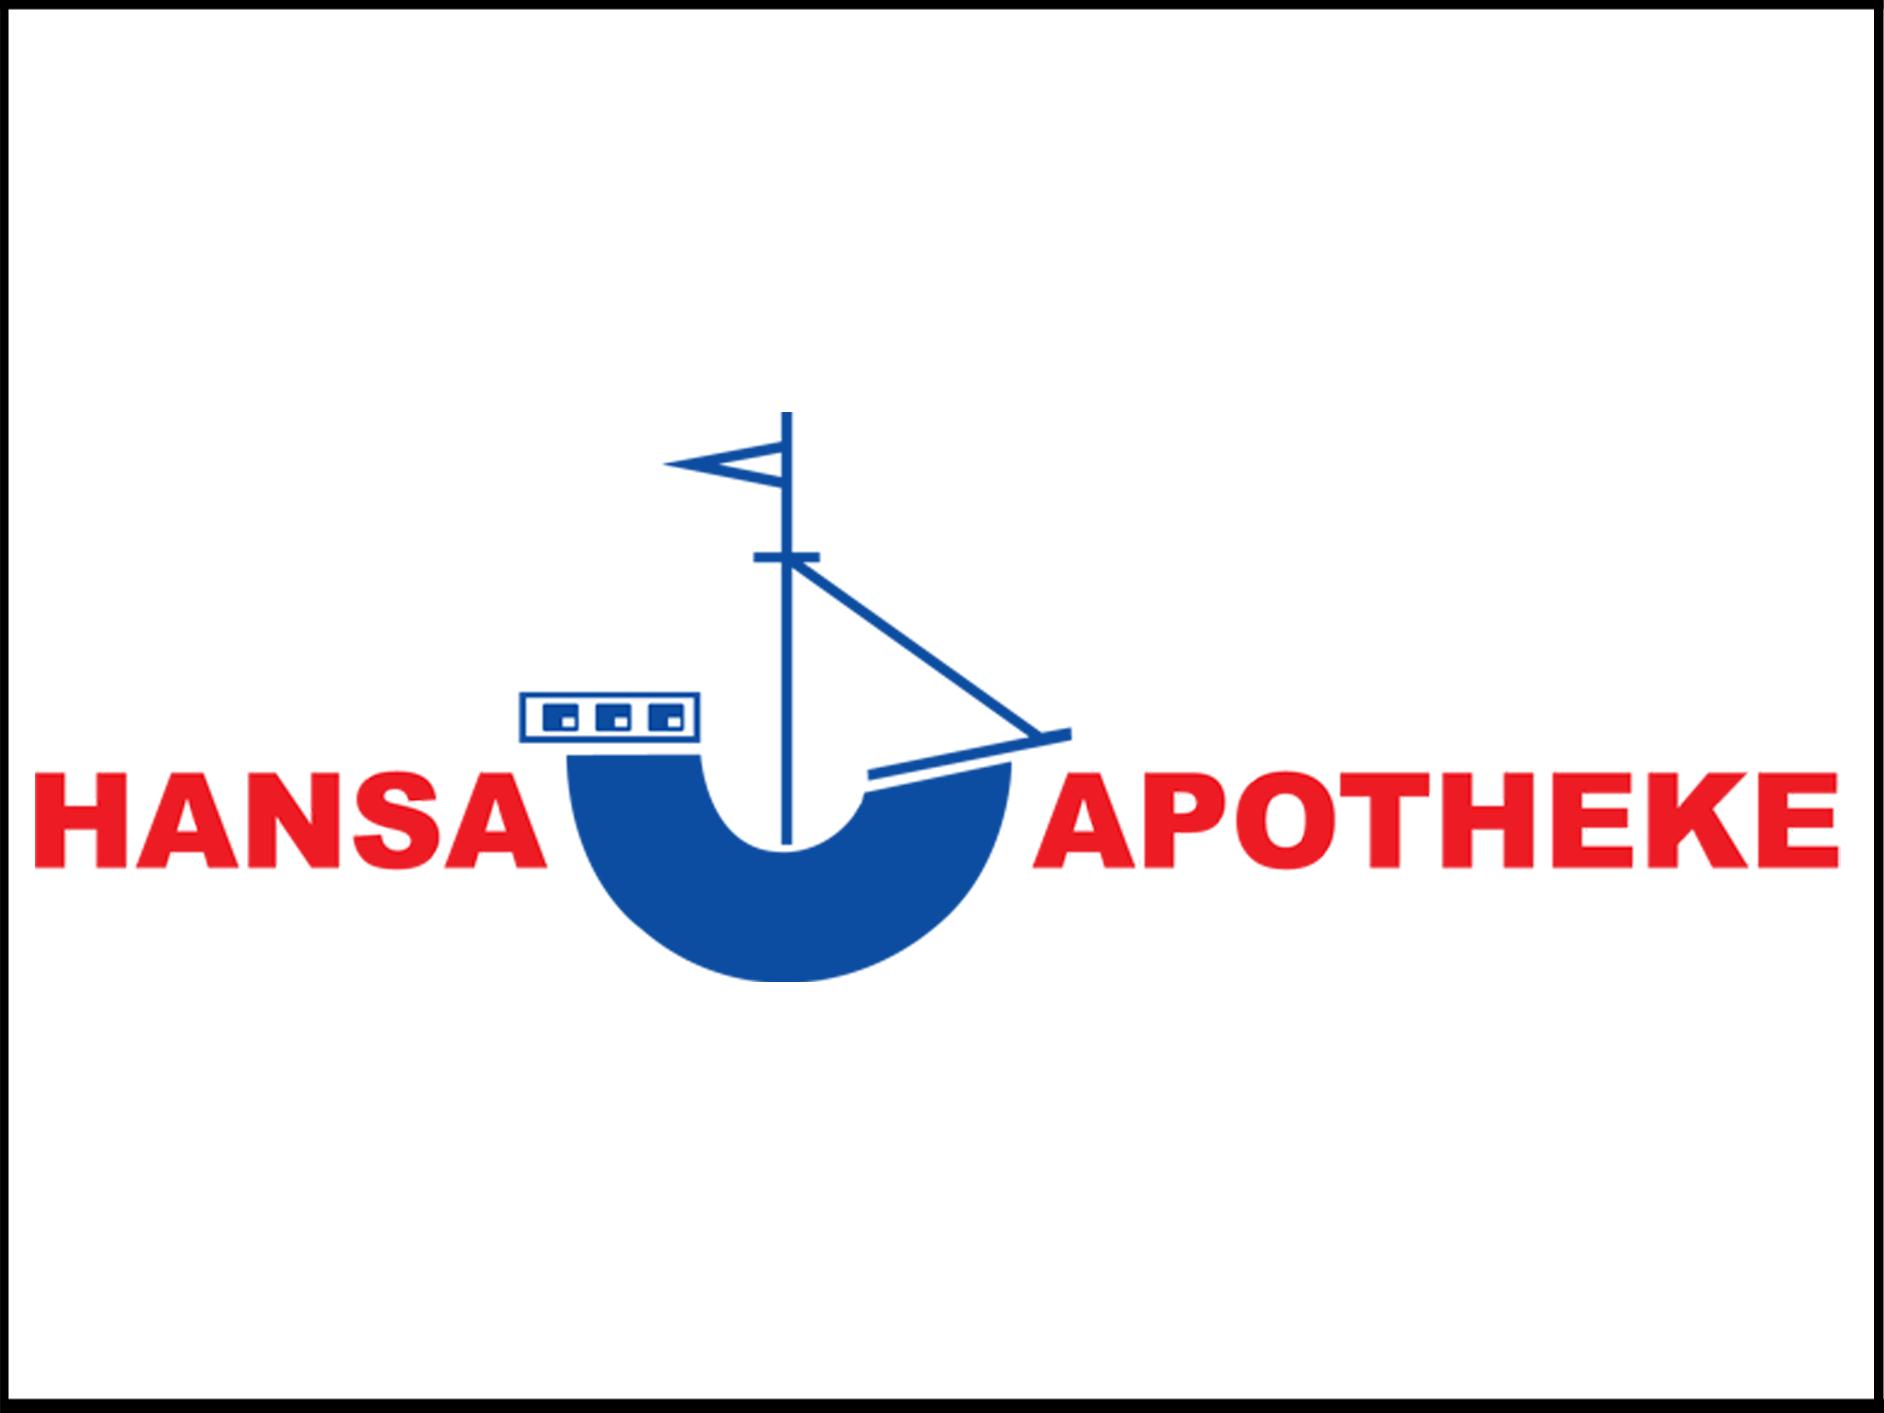 Hansa Apotheke